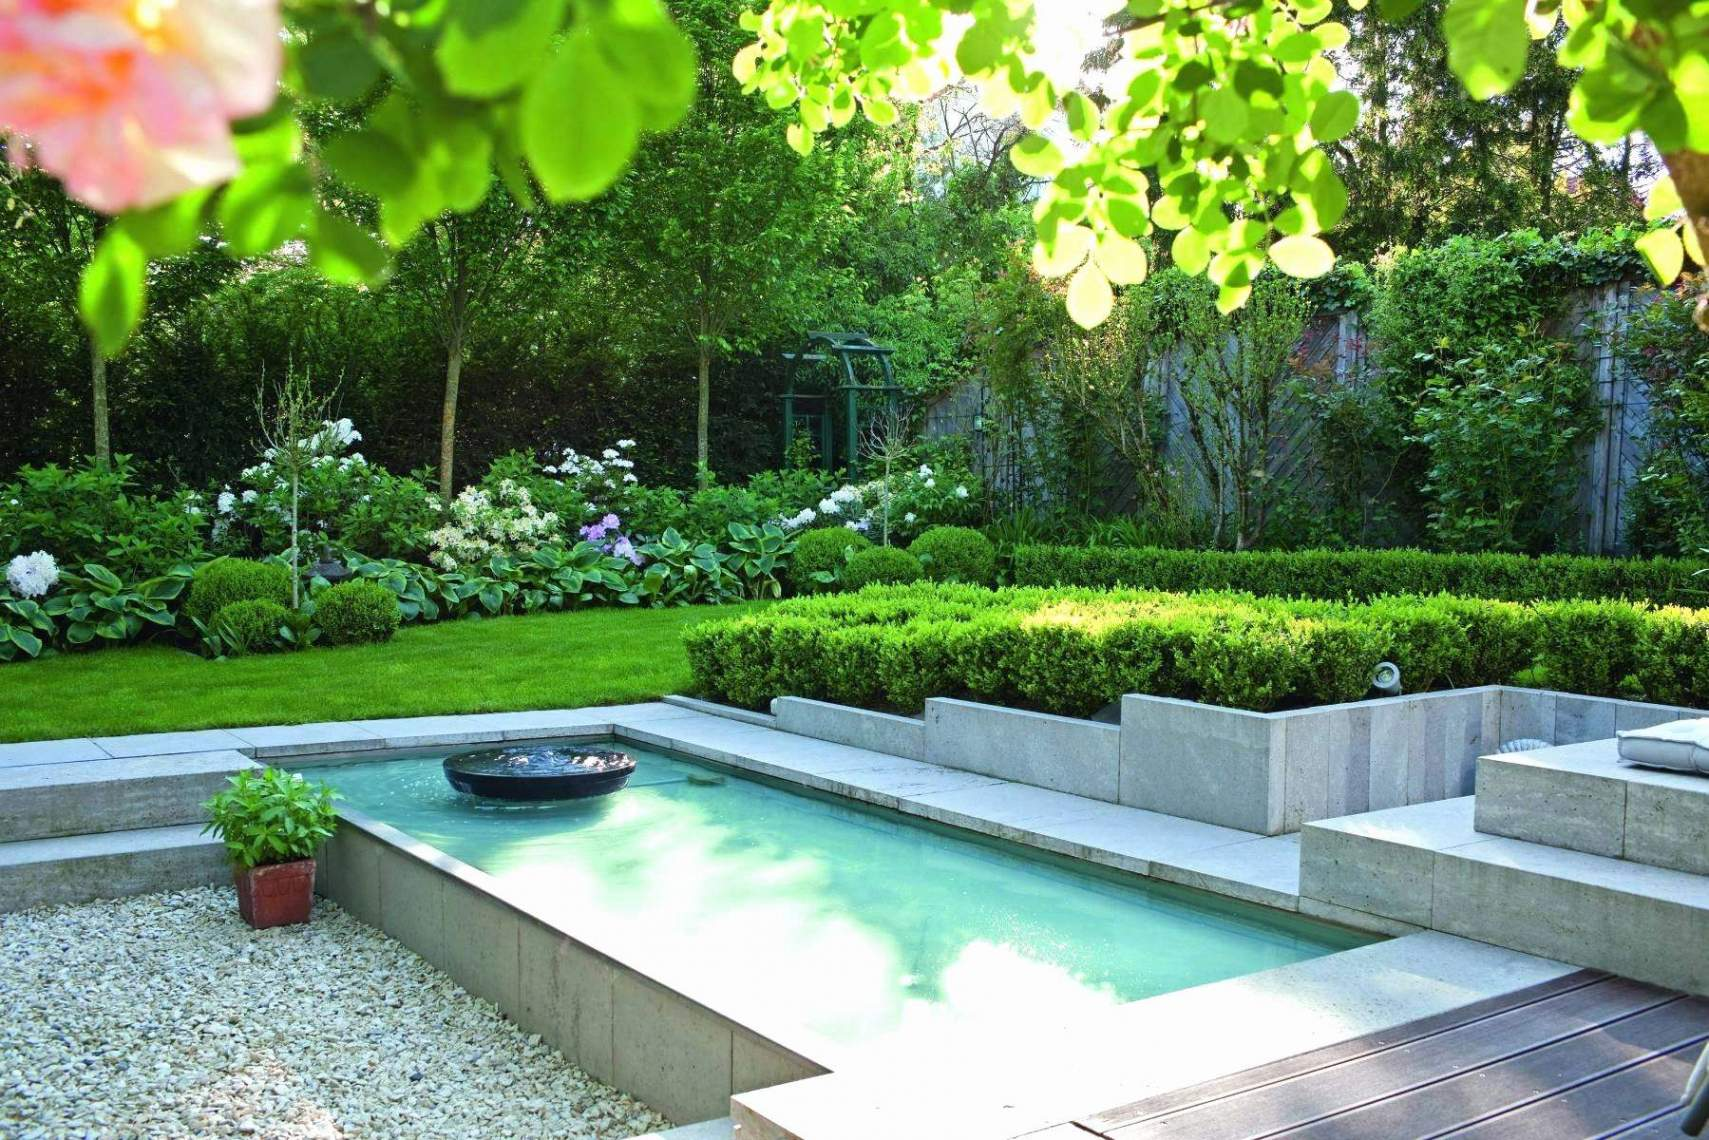 Großer Garten Inspirierend Gartengestaltung Großer Garten — Temobardz Home Blog